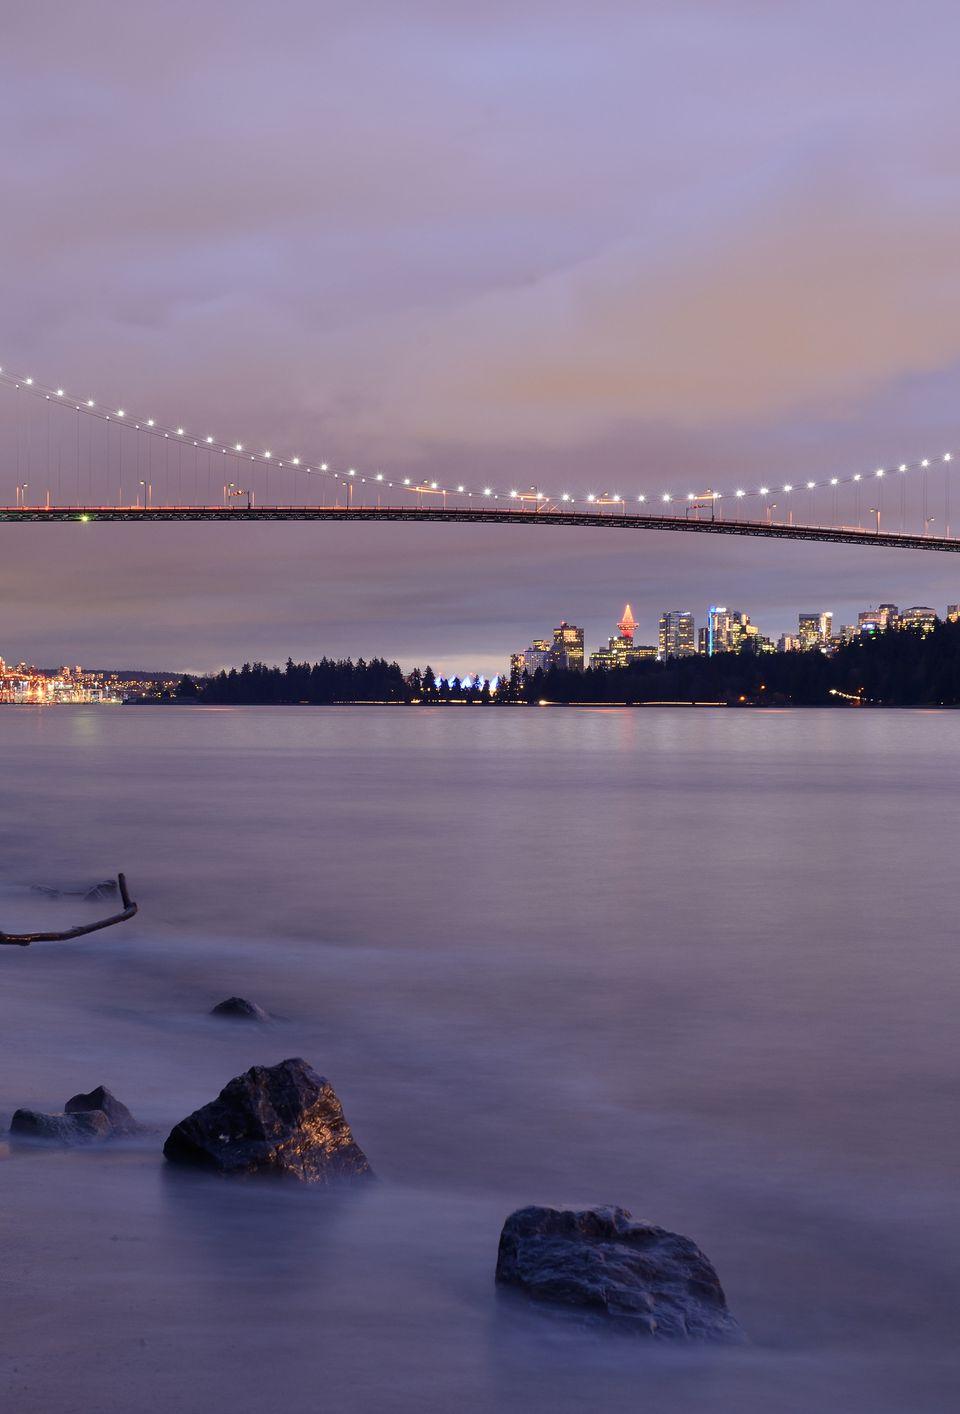 Lions Gate Bridge at night, Vancouver